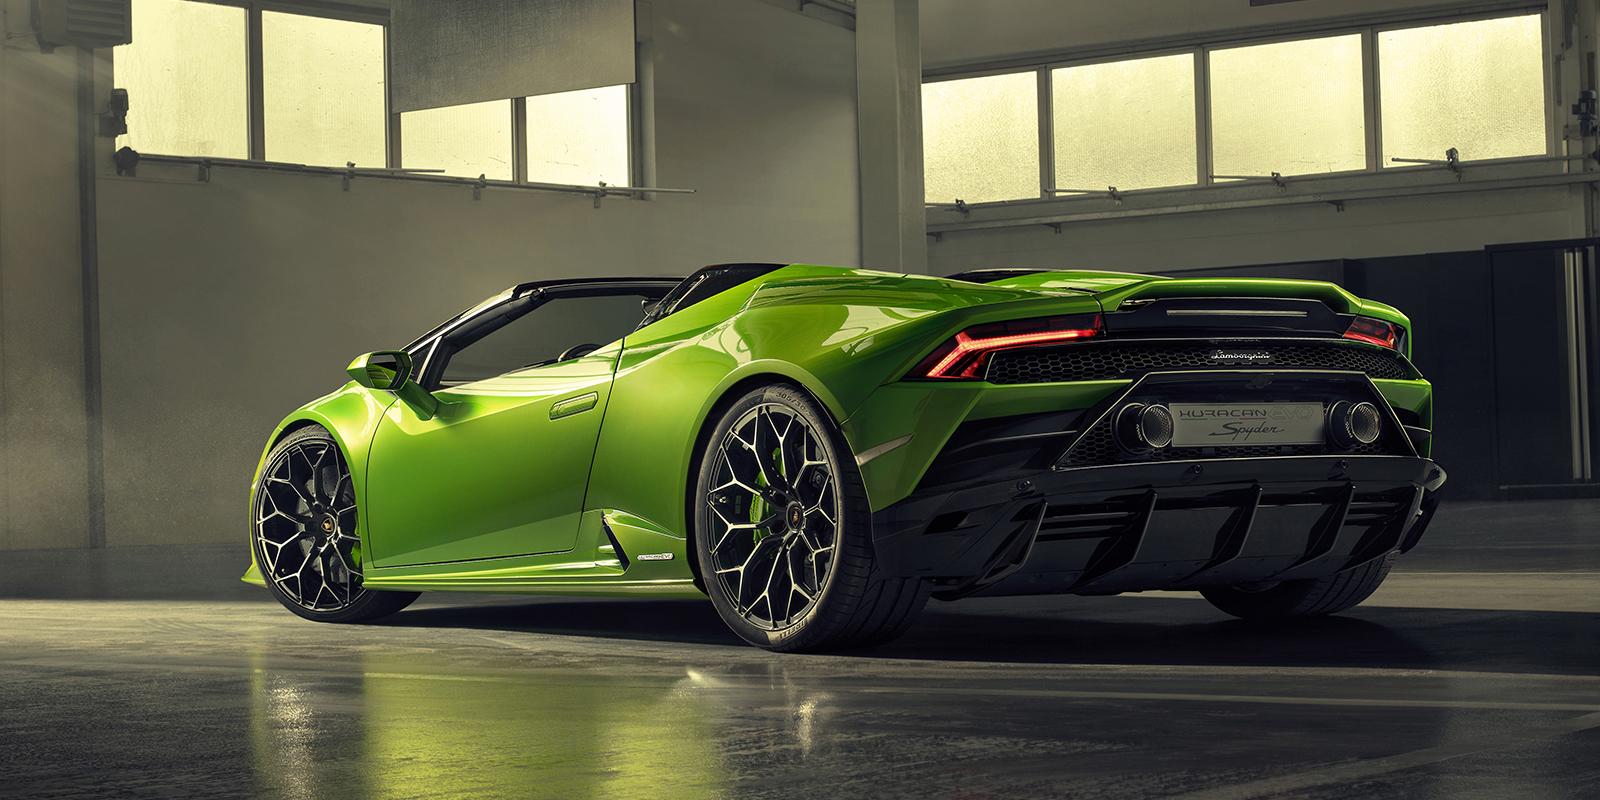 Gallery The Lamborghini Huracan Evo Spyder Is Here Vwvortex